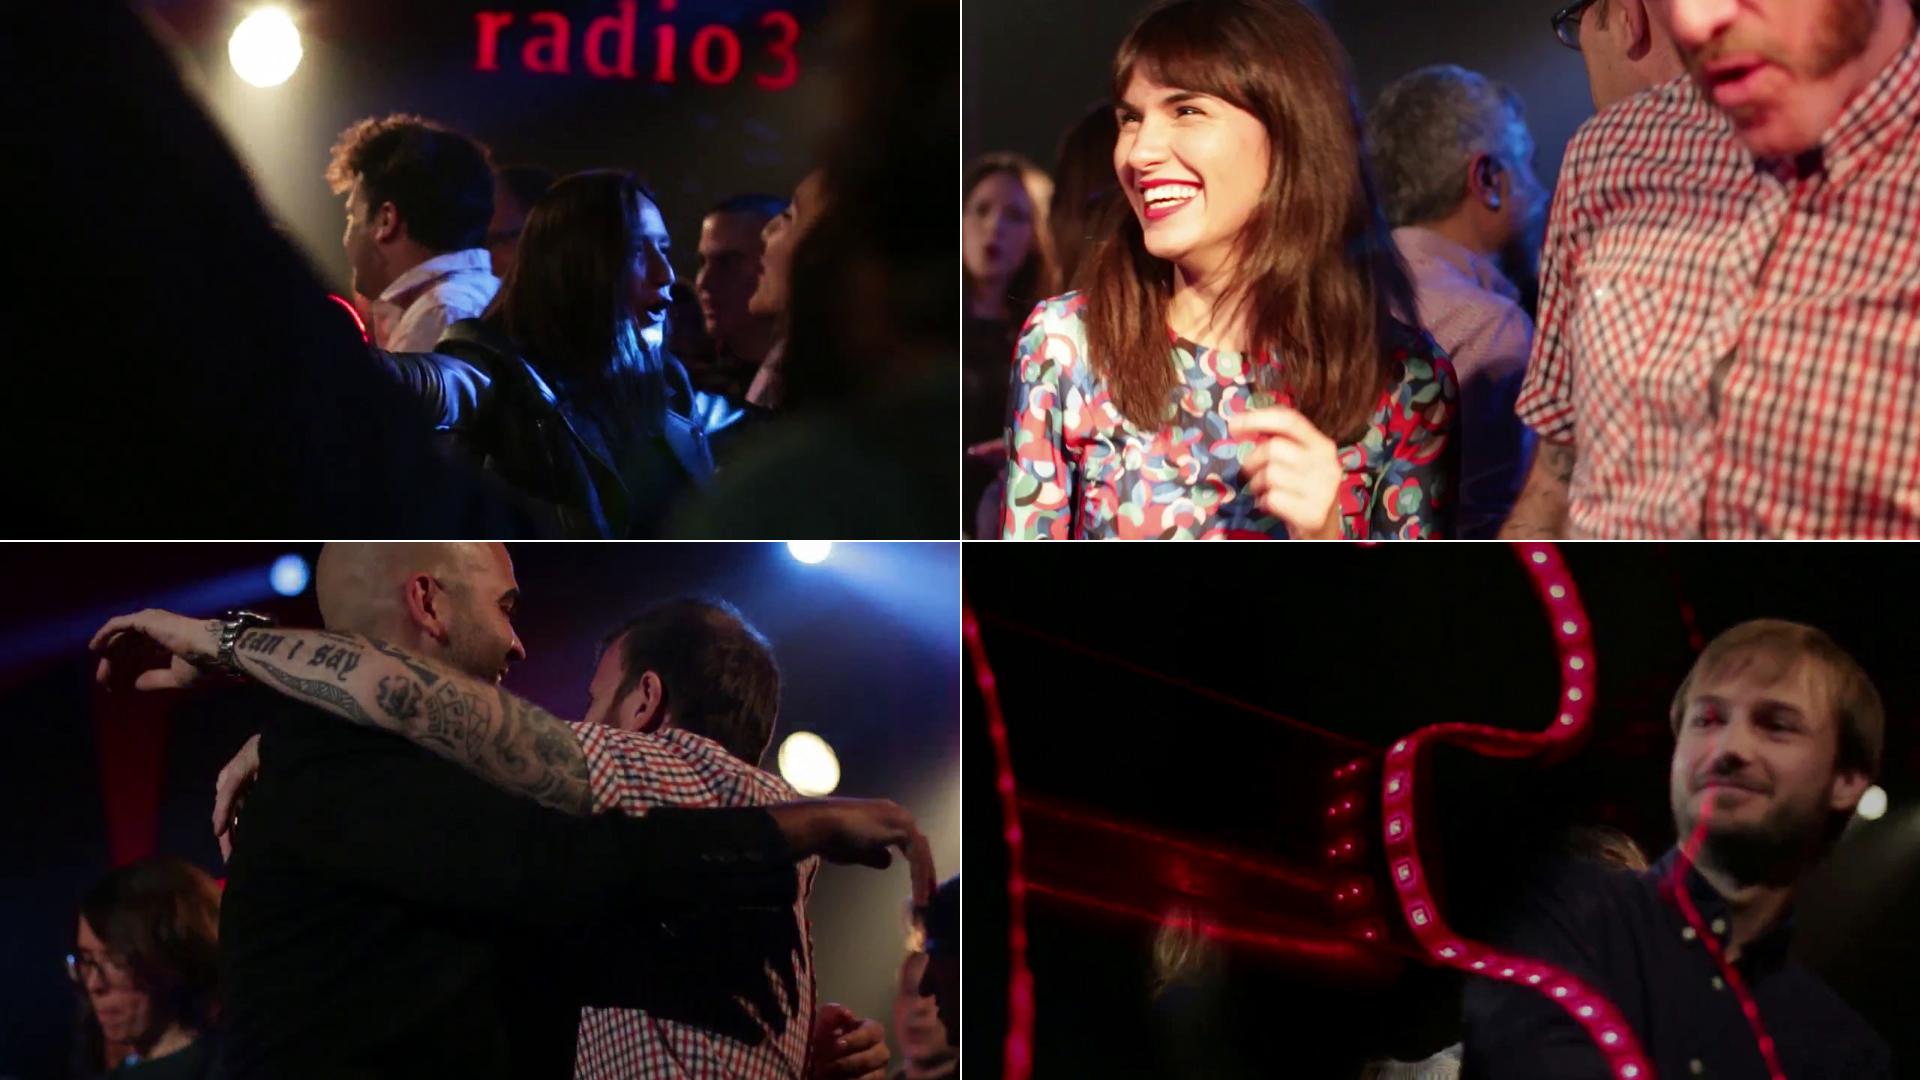 Radio 3 te desea un feliz 2018